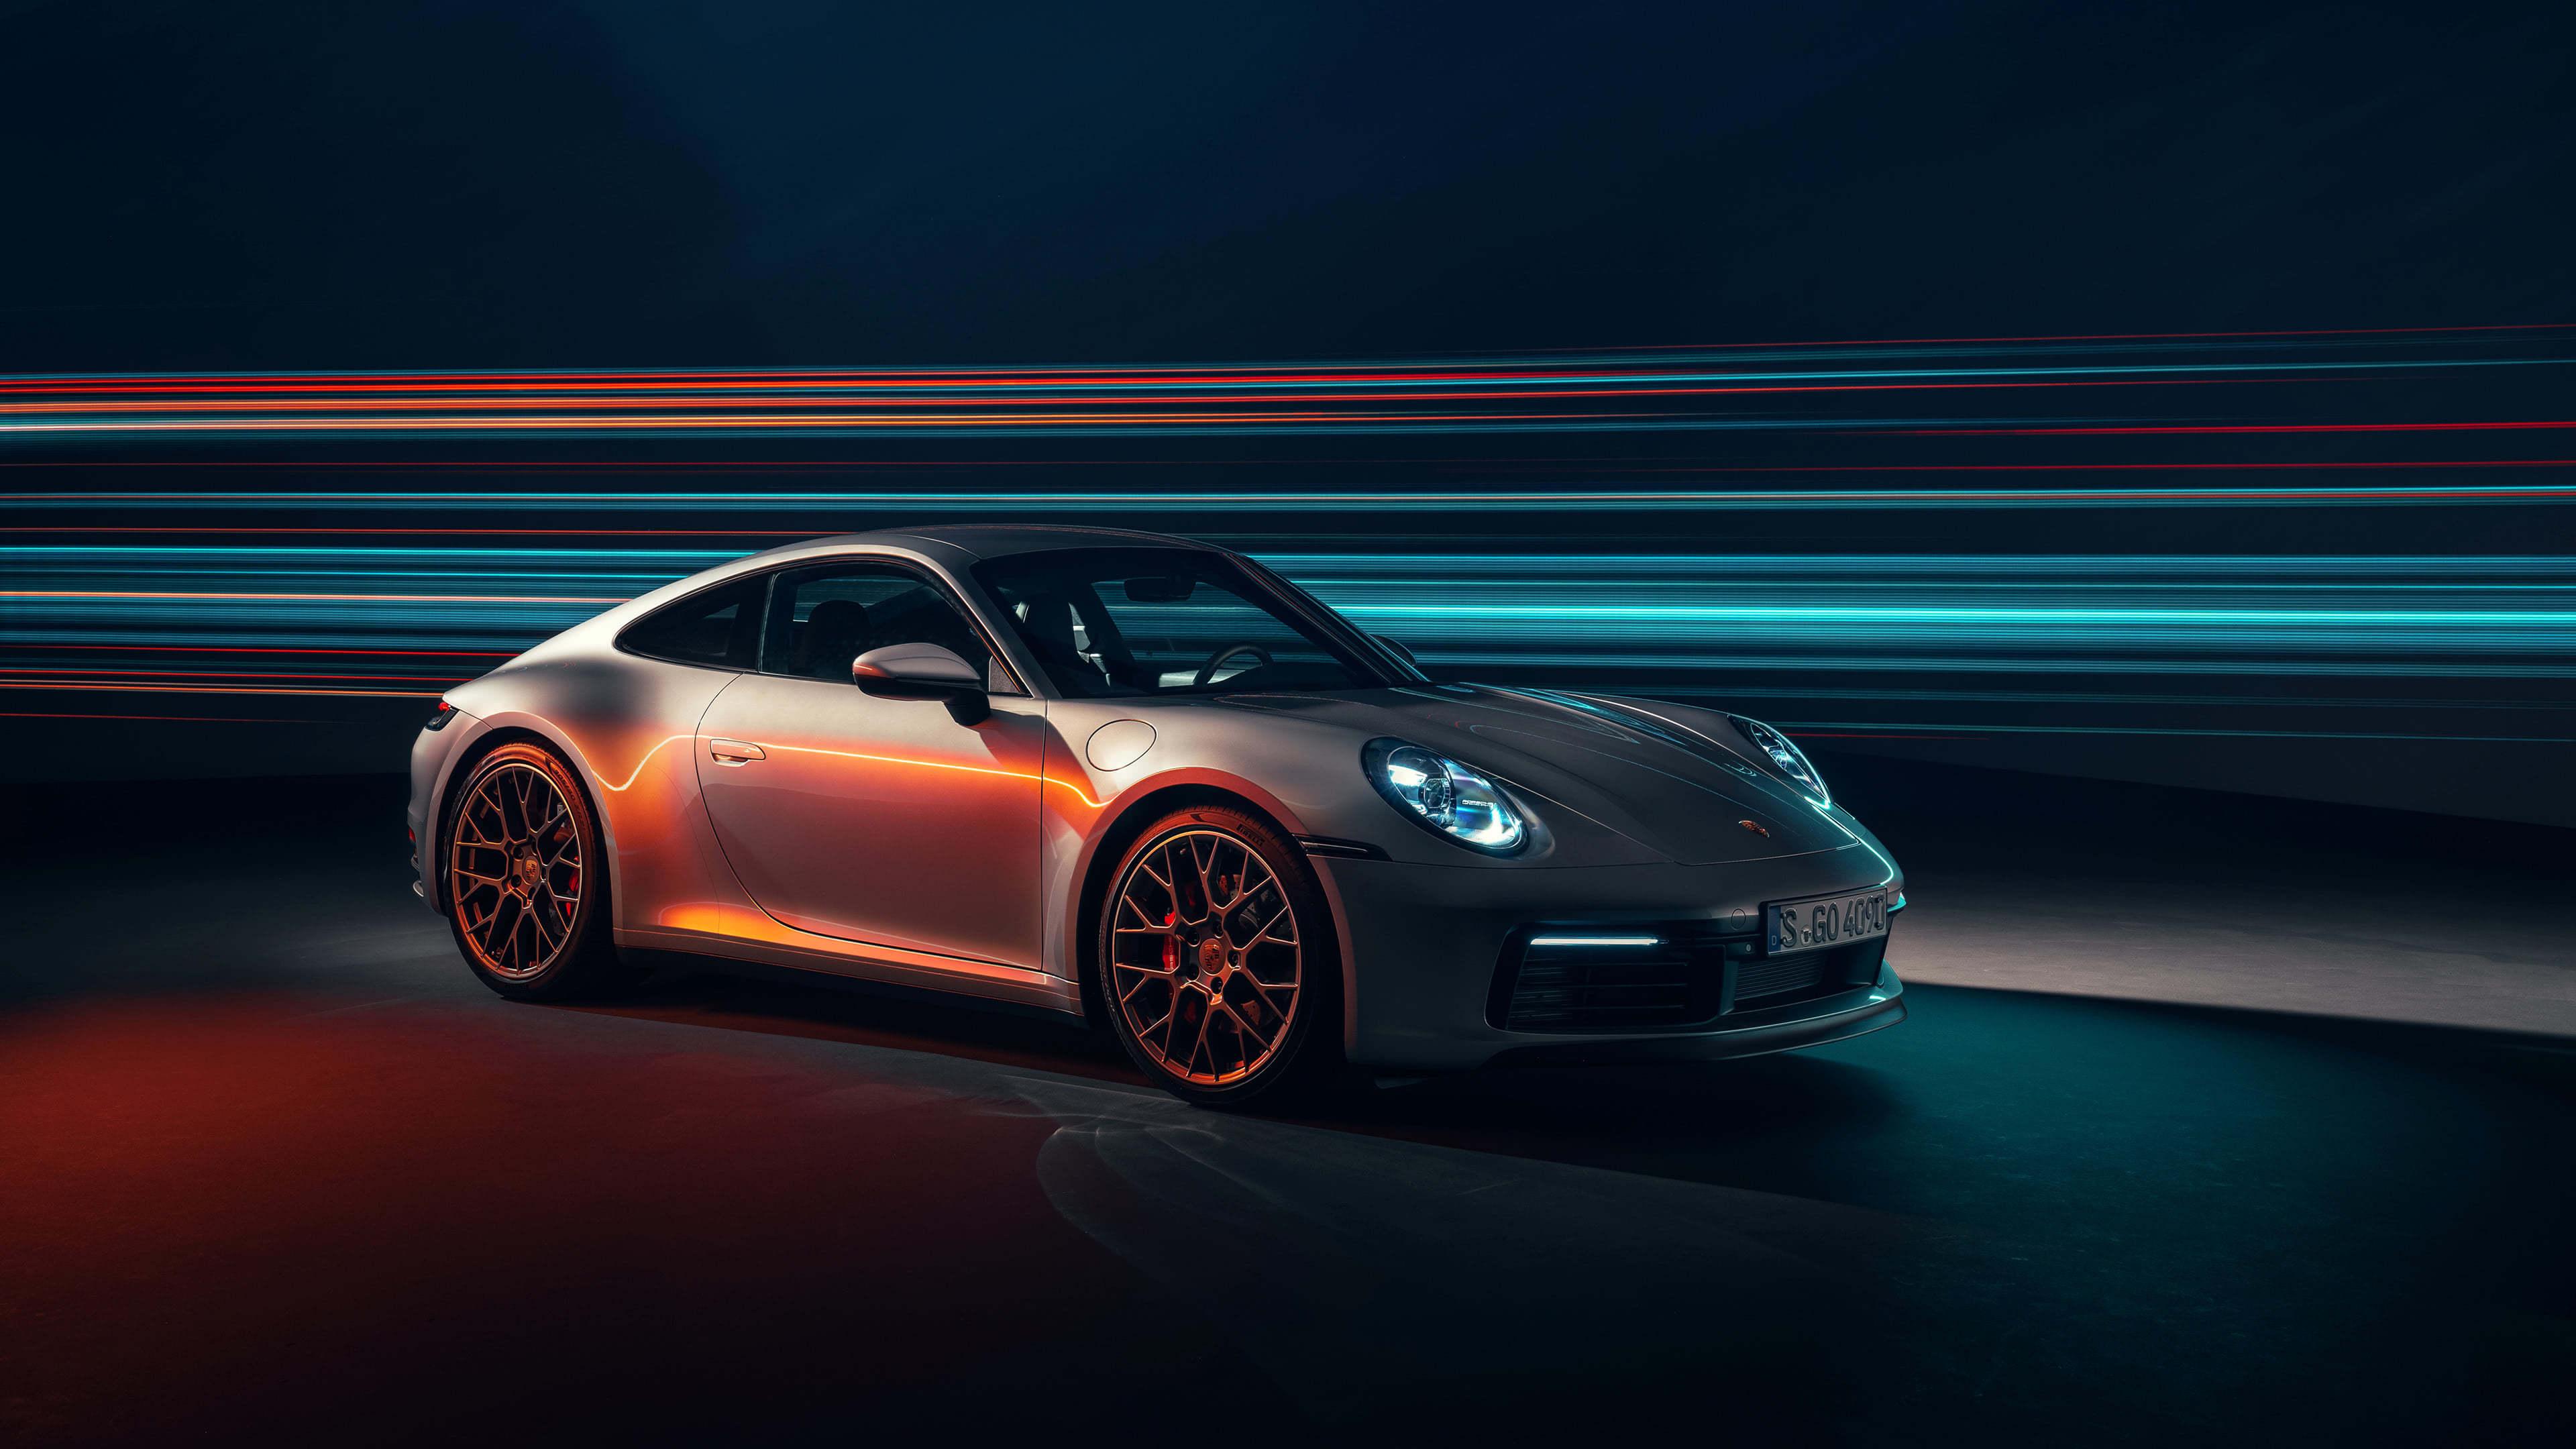 Porsche 911 Carrera UHD 4K Wallpaper Pixelz 3840x2160